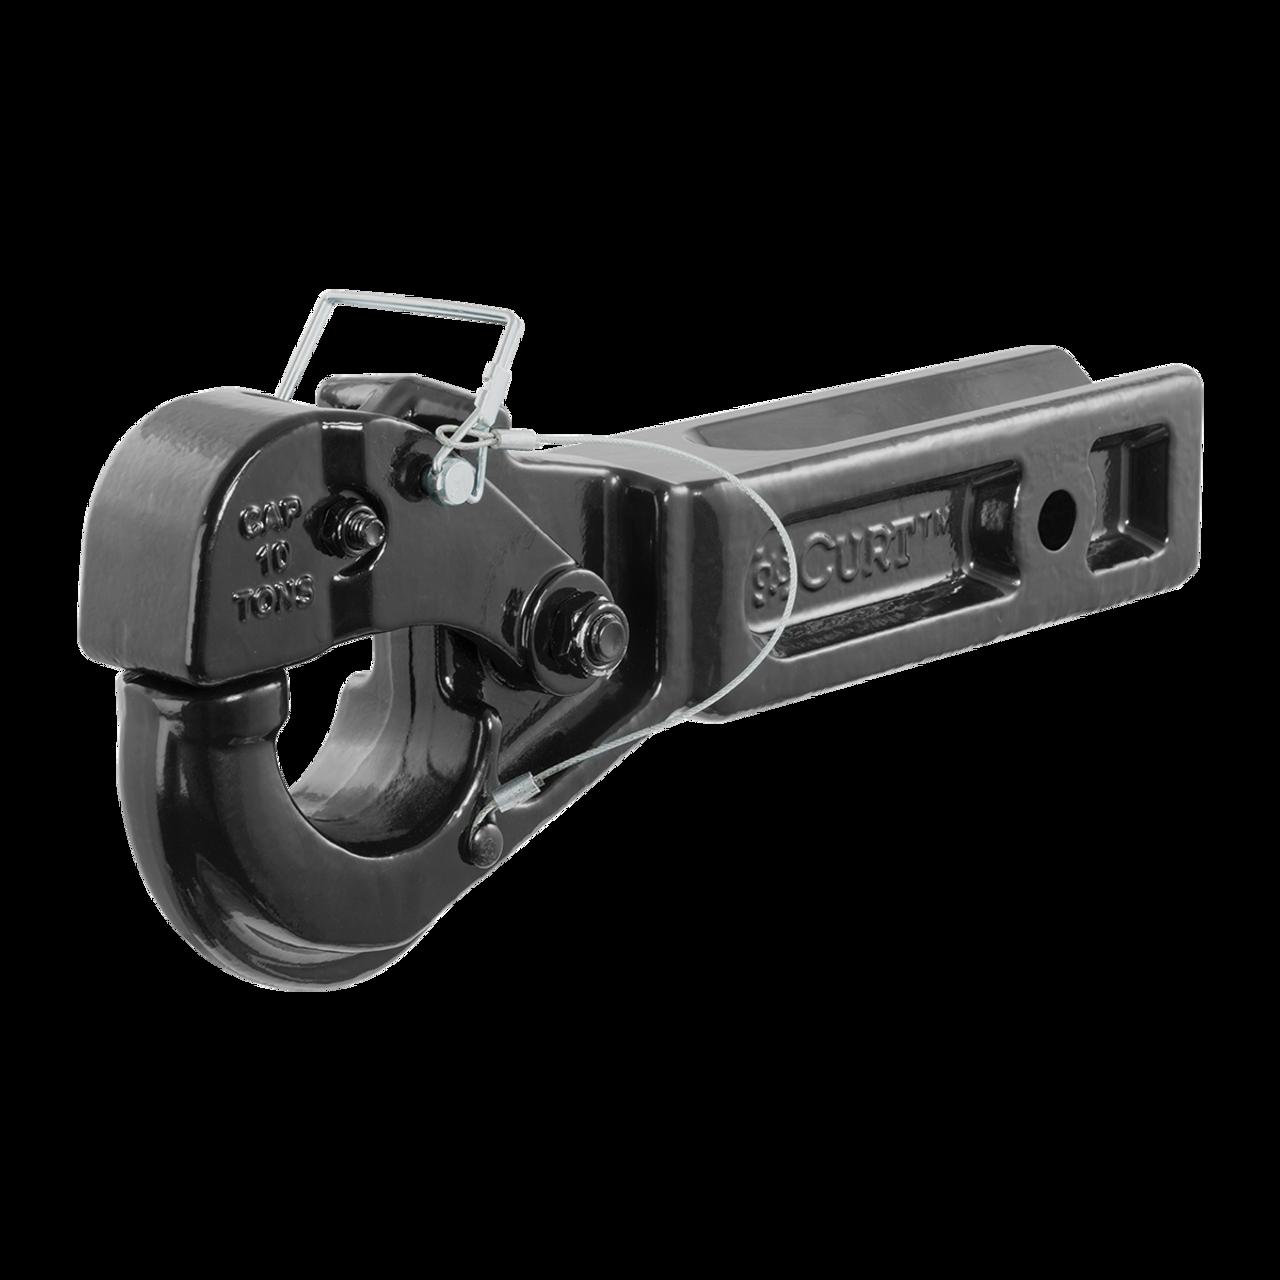 "RMPH5-25 --- Receiver Mount Pintle Hook - 5 Ton Capacity - 2.5"" Receivers"